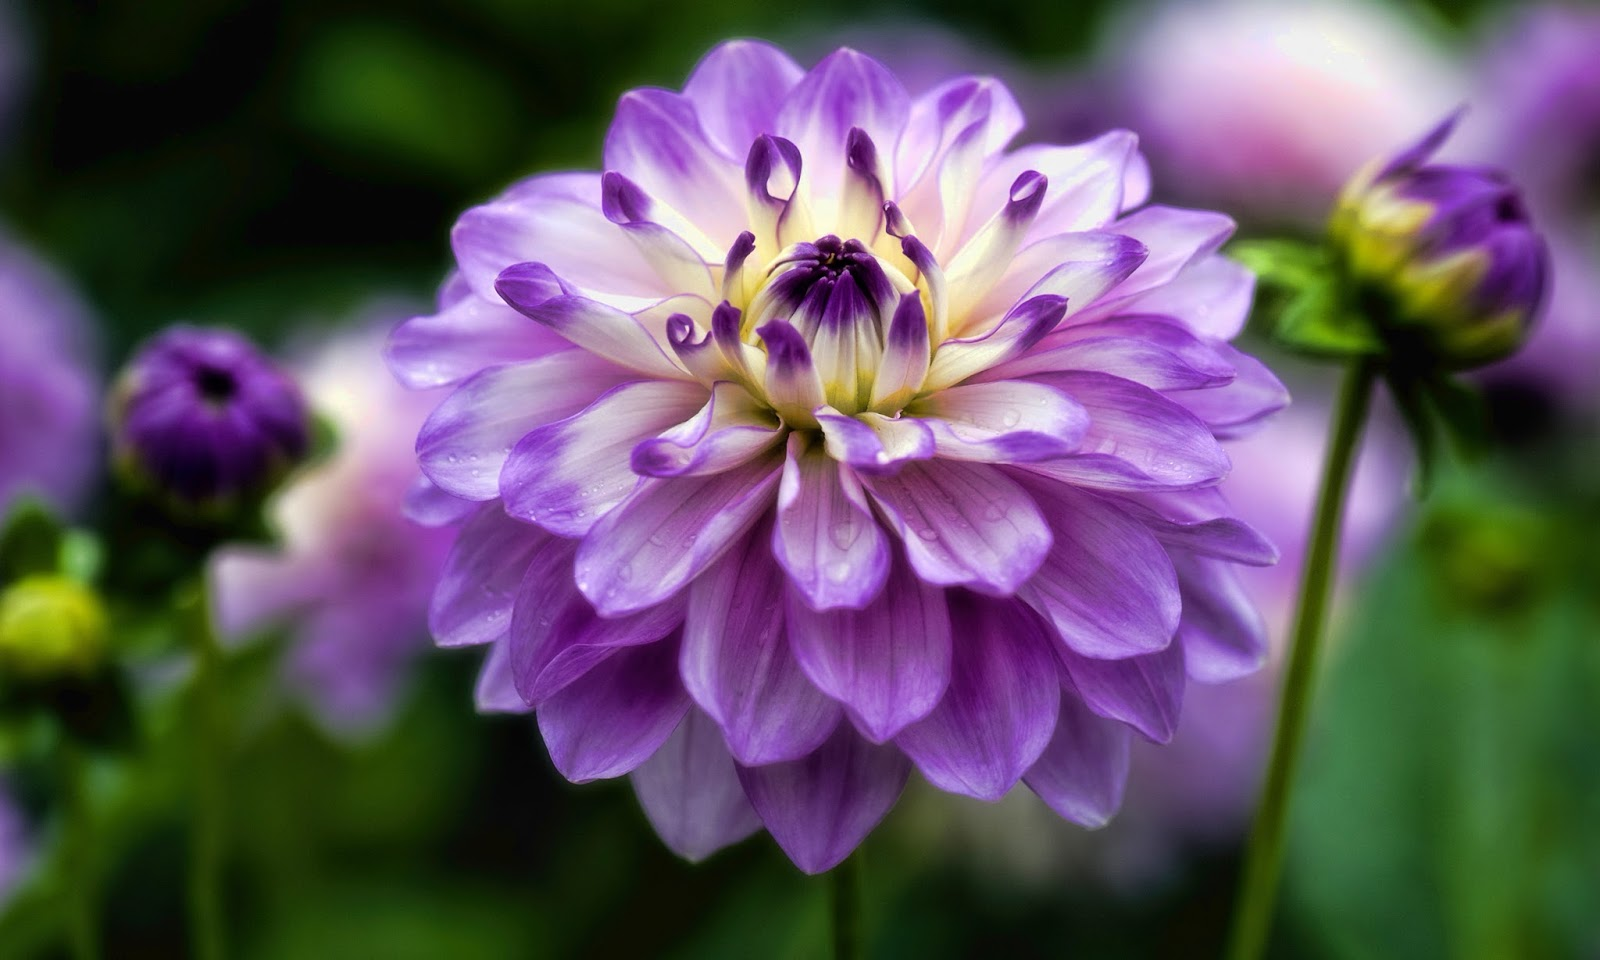 Dahlia Flower HD Wallpapers | HD Wallpapers (High ...